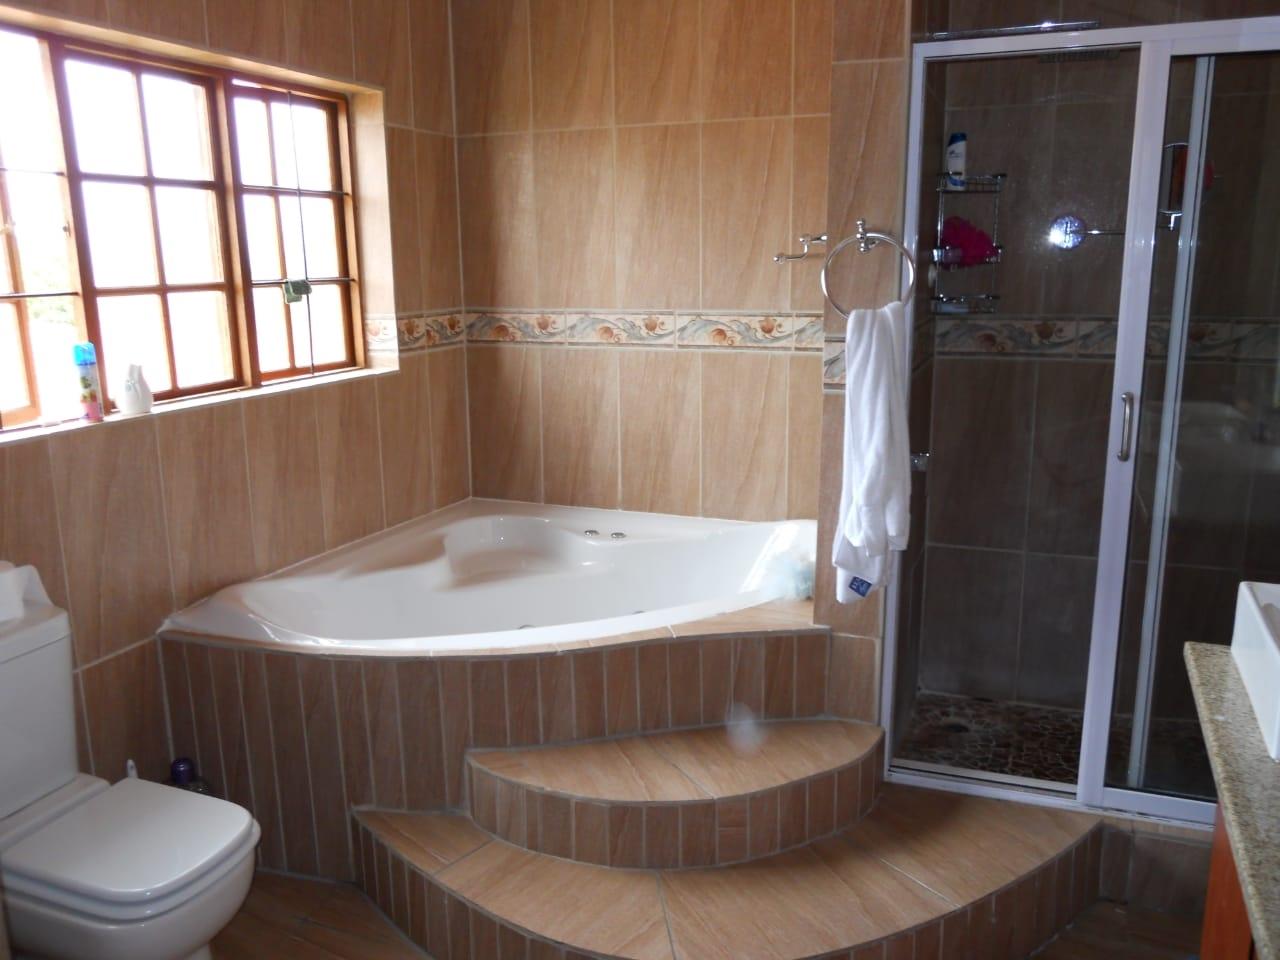 Main bedroom en-suite bathroom with toilet, corner bath, shower and wash basin